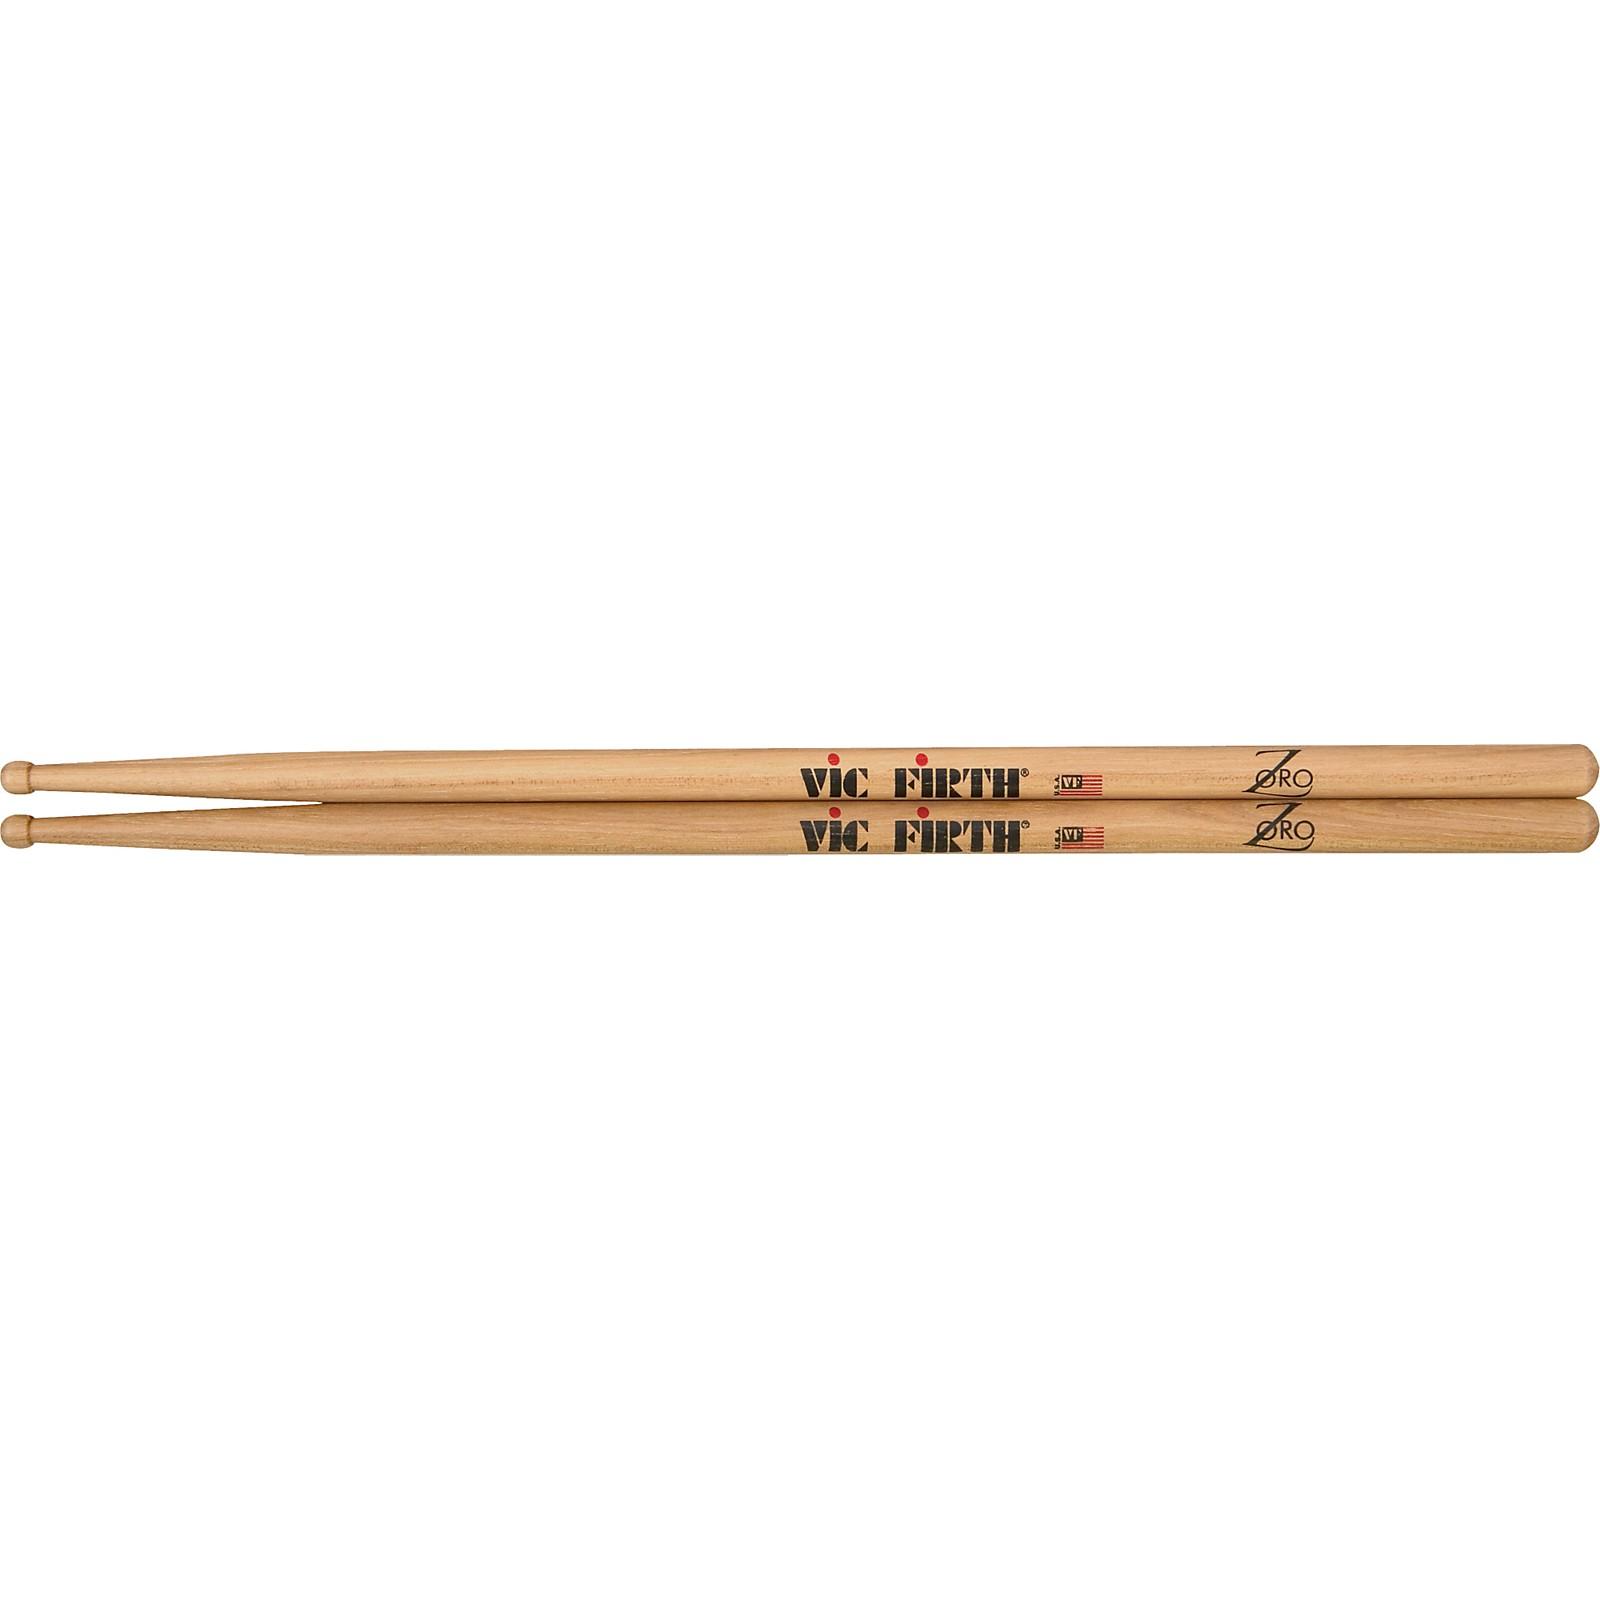 Vic Firth Zoro Signature Drumstick